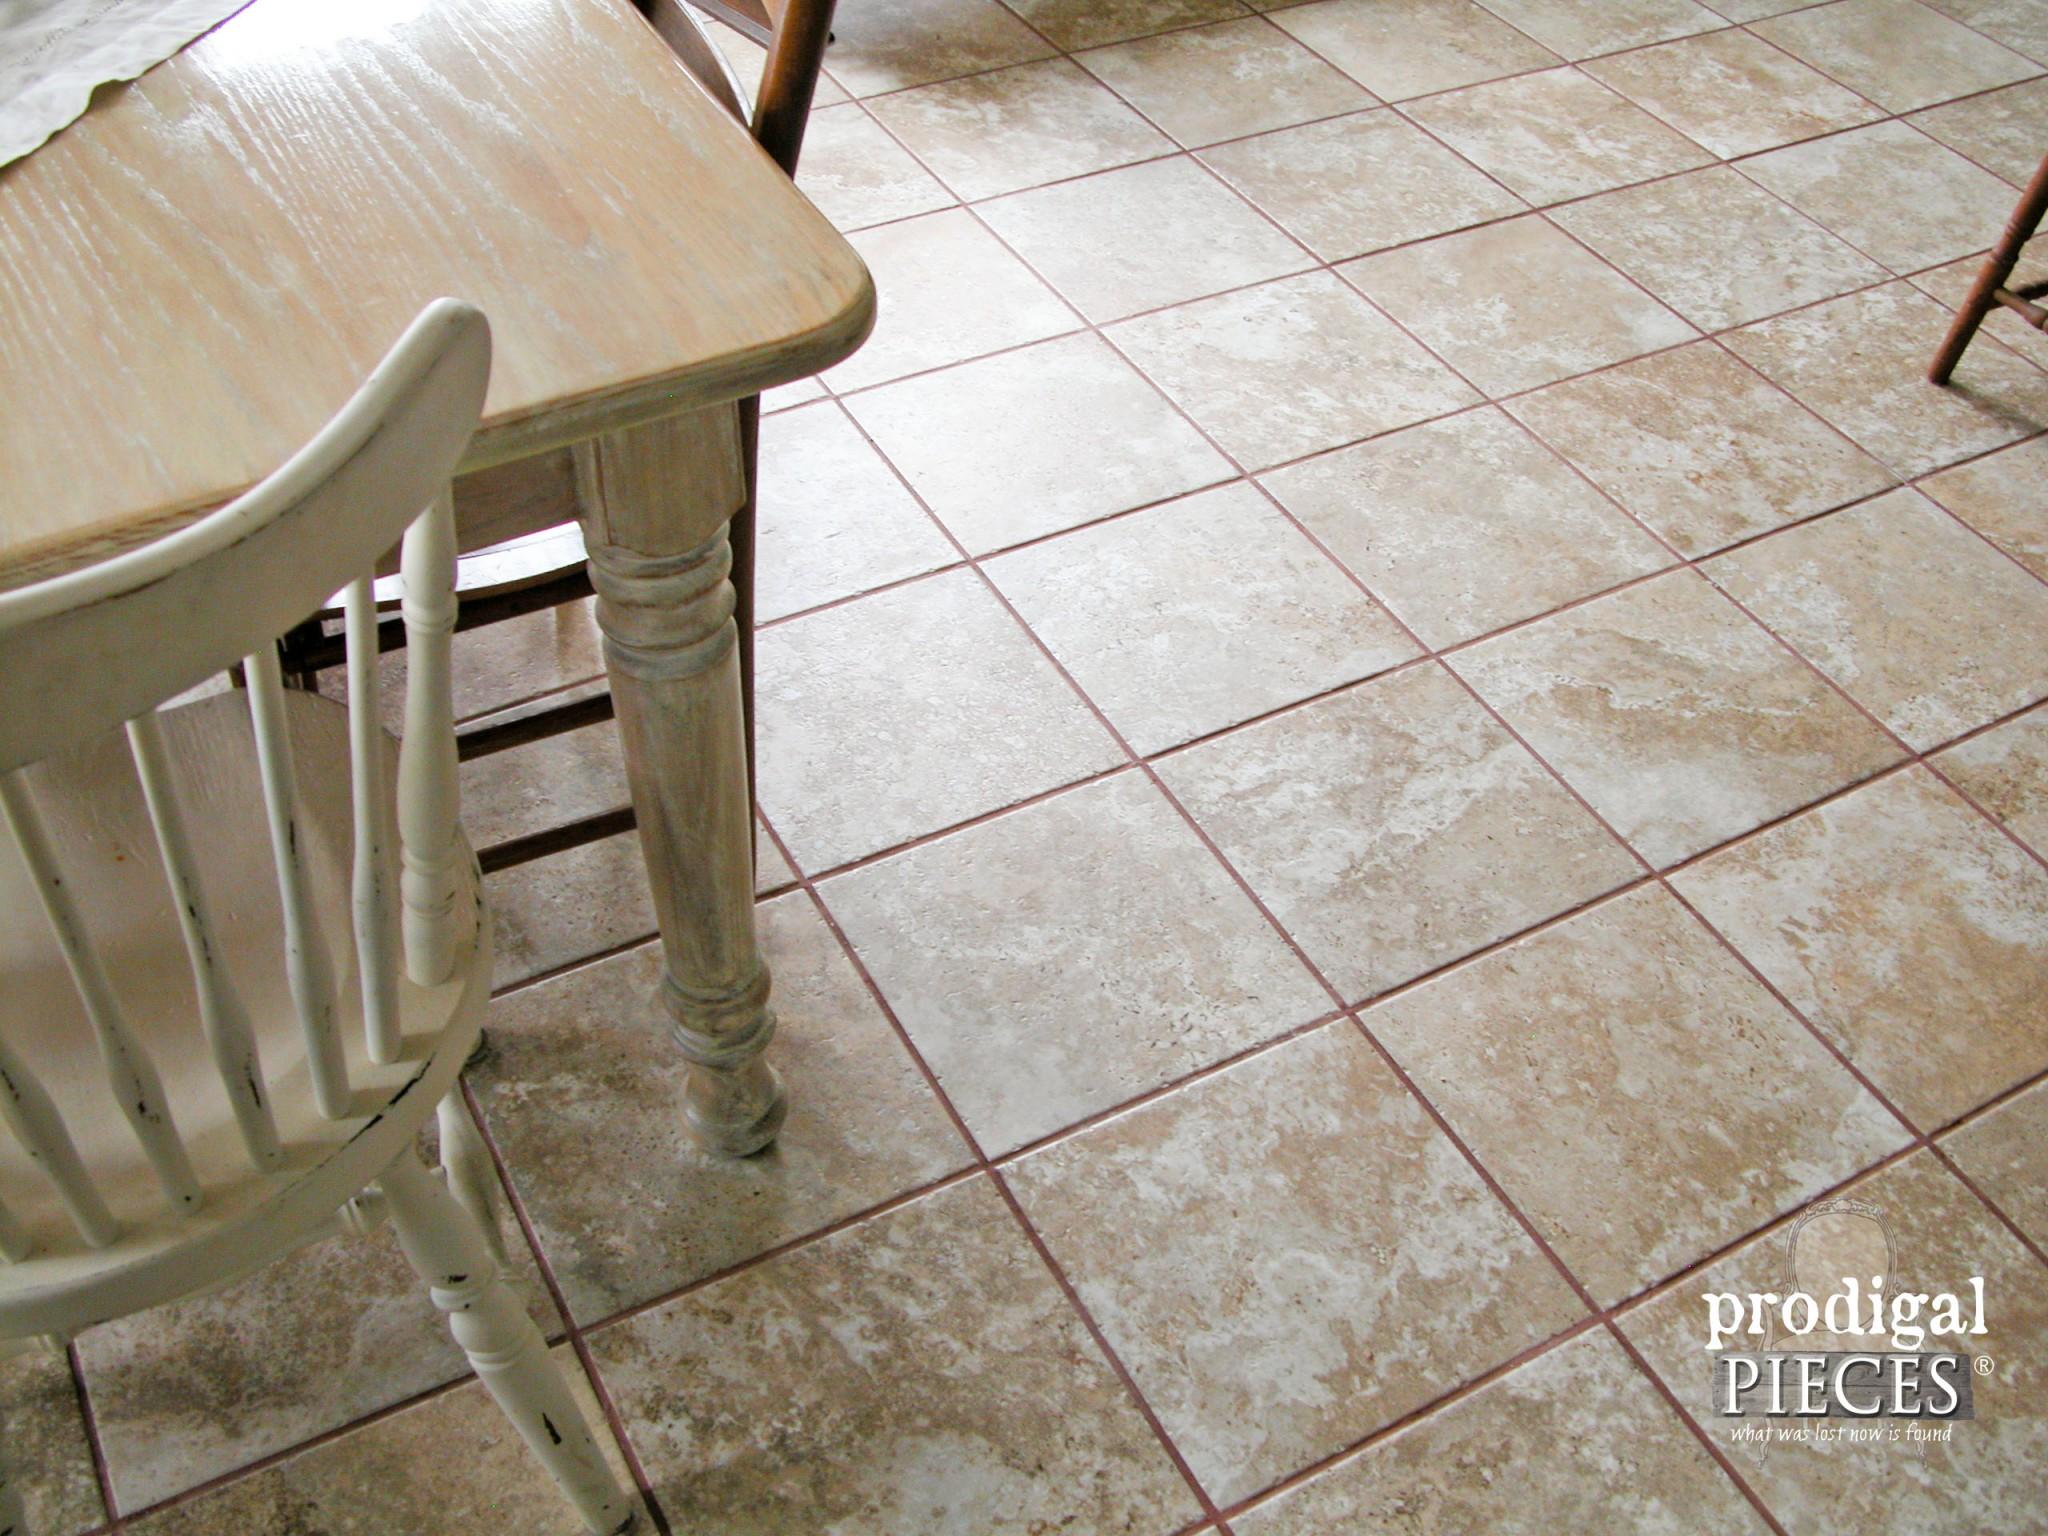 Porcelain Stone Look Kitchen Tile By Prodigal Pieces Www Prodigalpieces